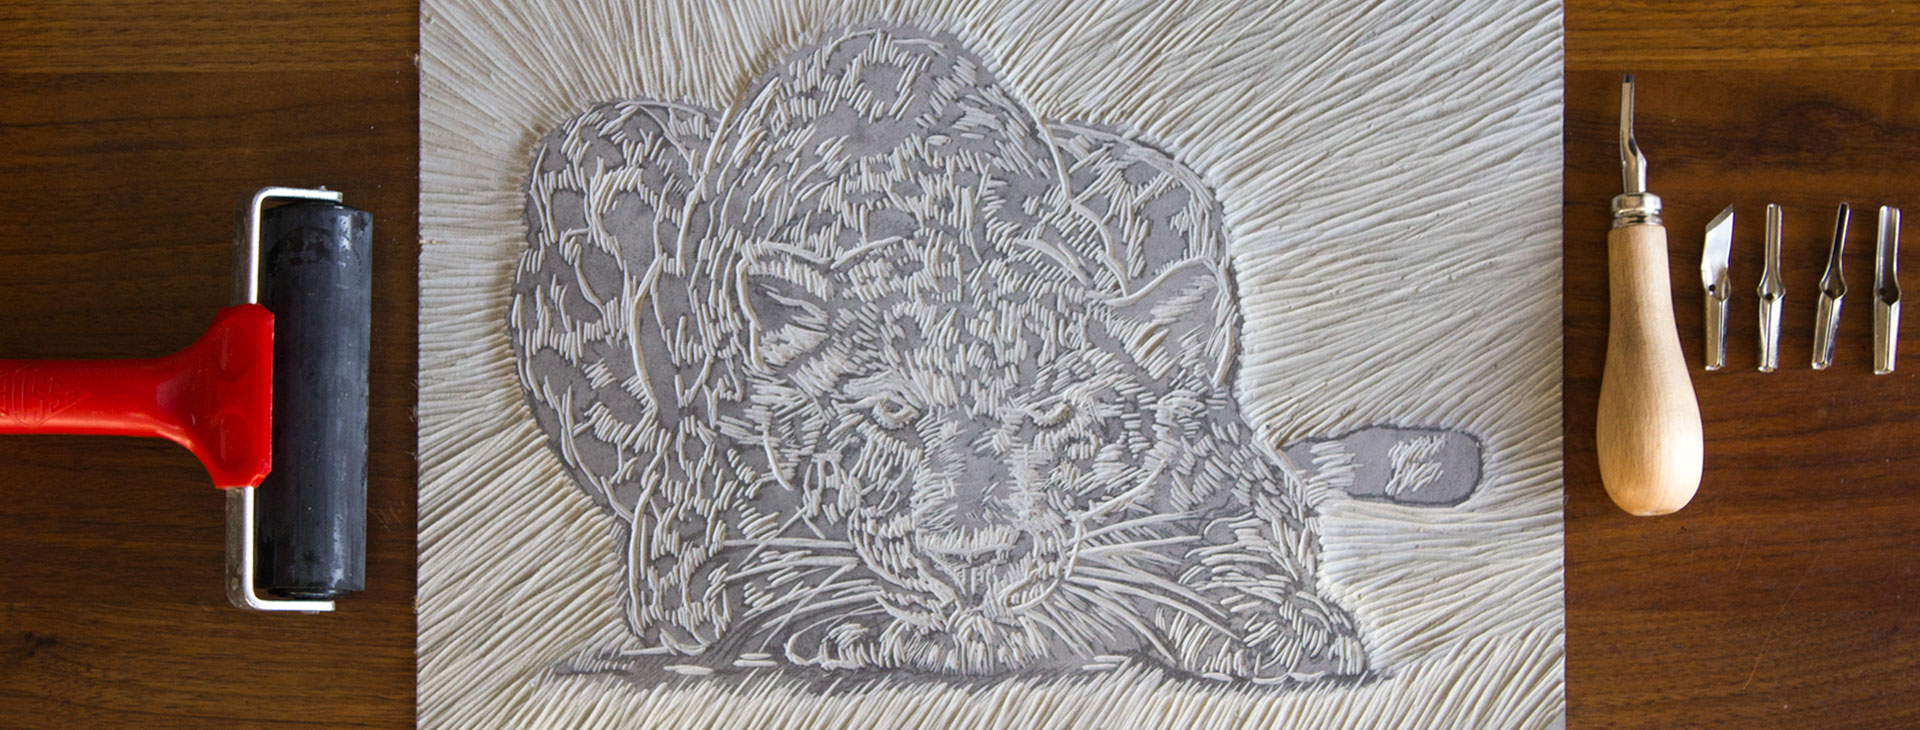 Linocut of a leopard for a wine label design